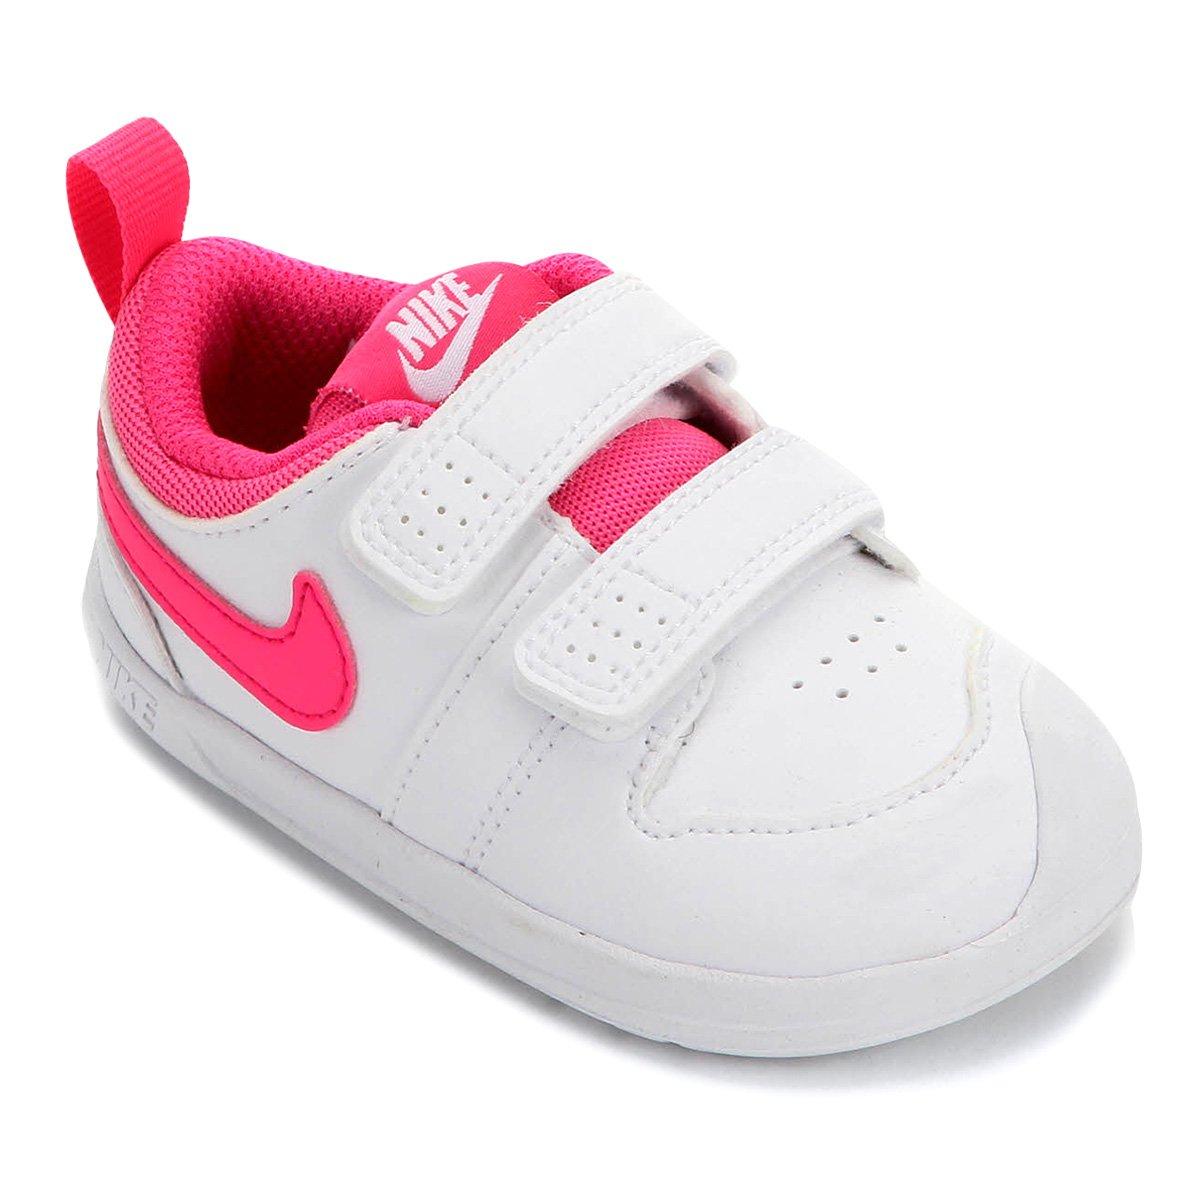 Tênis Infantil Nike Pico 5 Velcro - Tam: 24